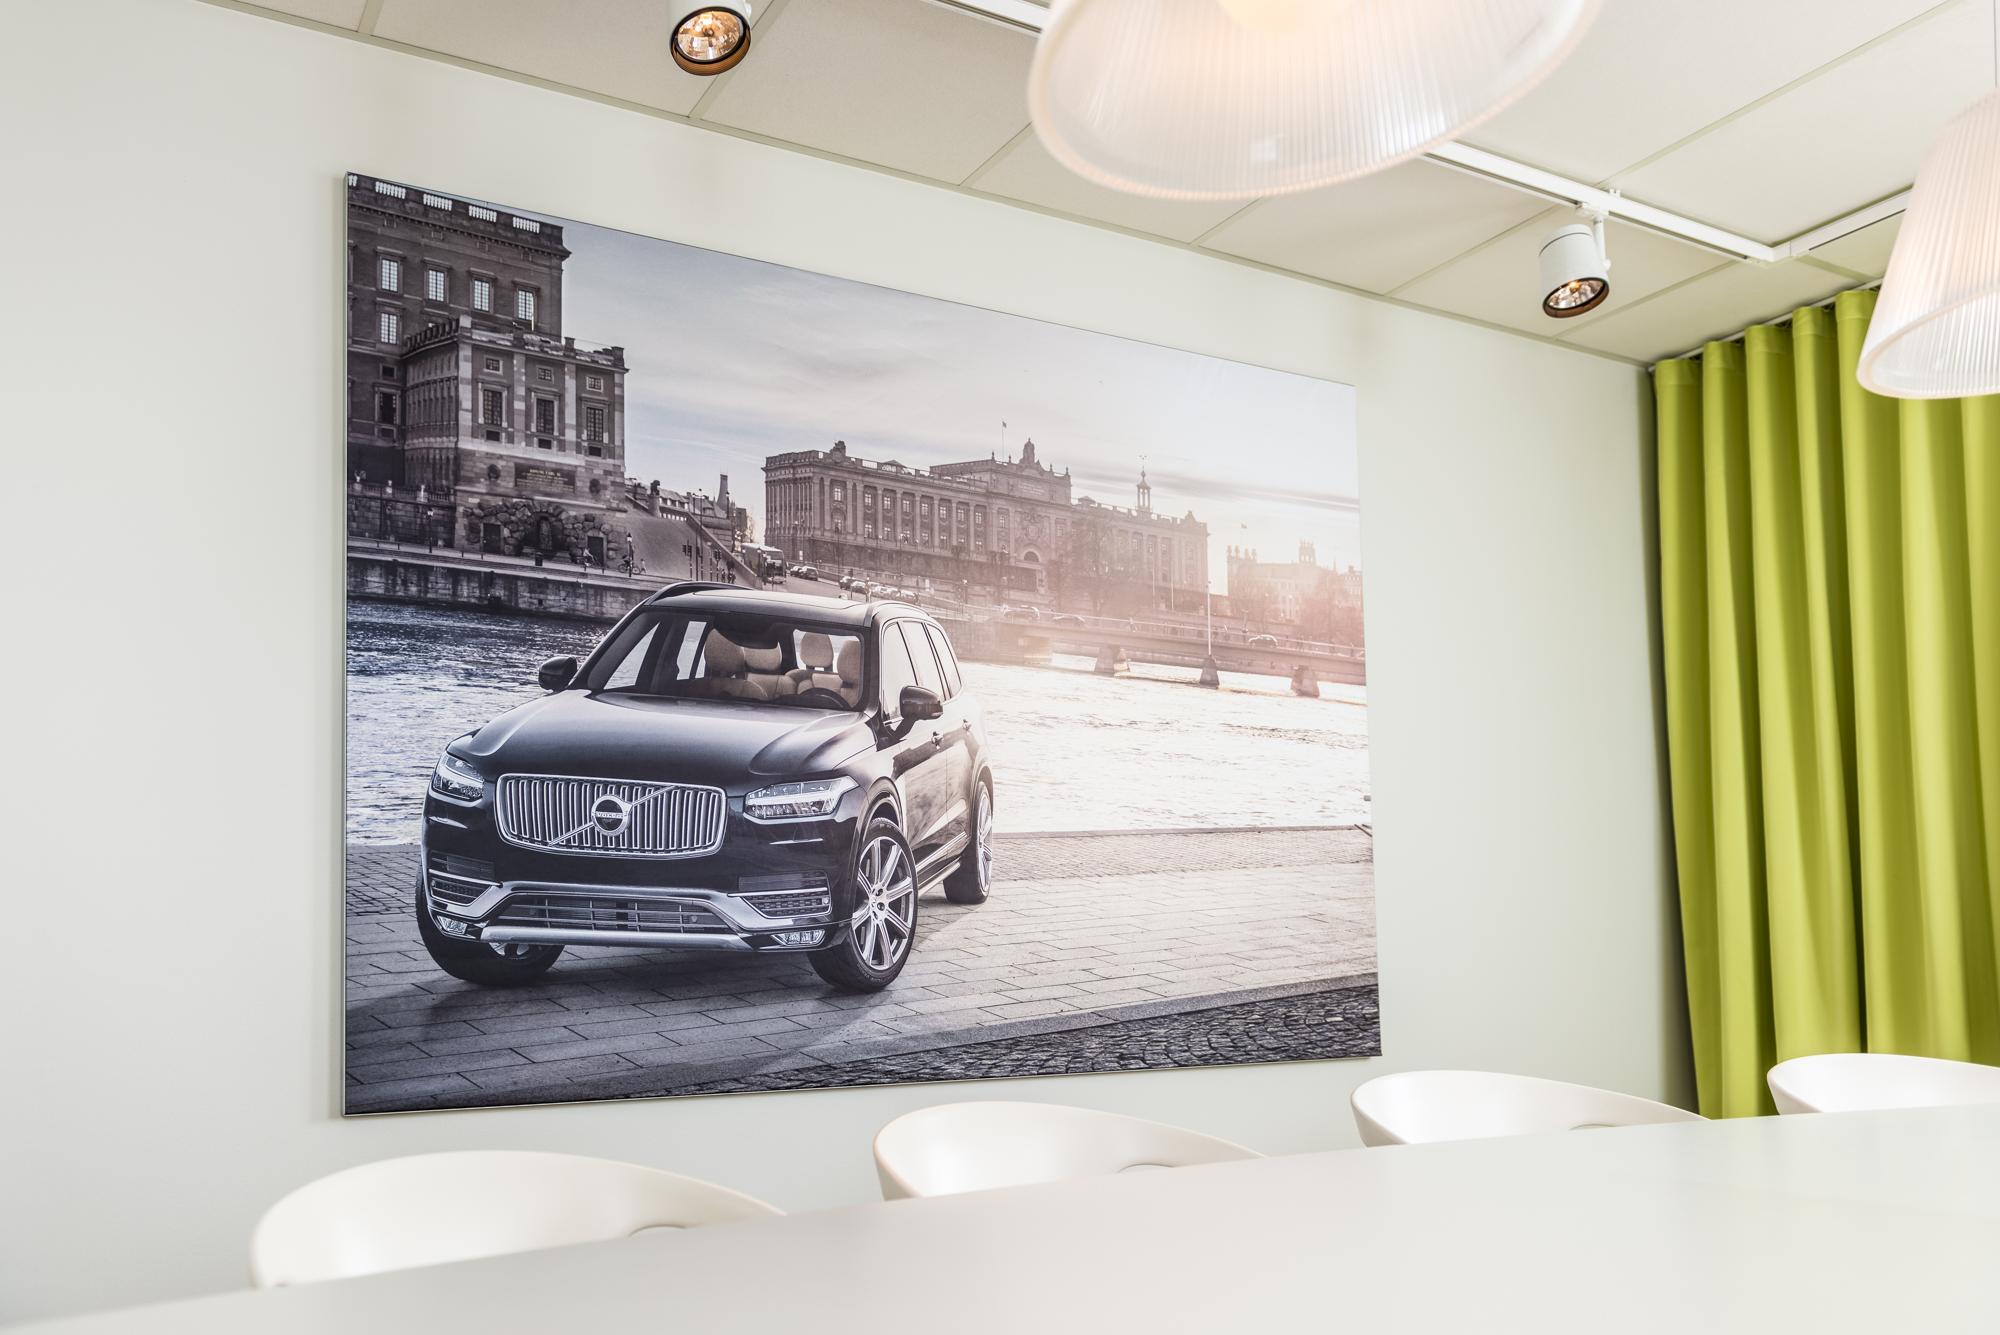 FineLine™ Fabric Retail Wall Displays